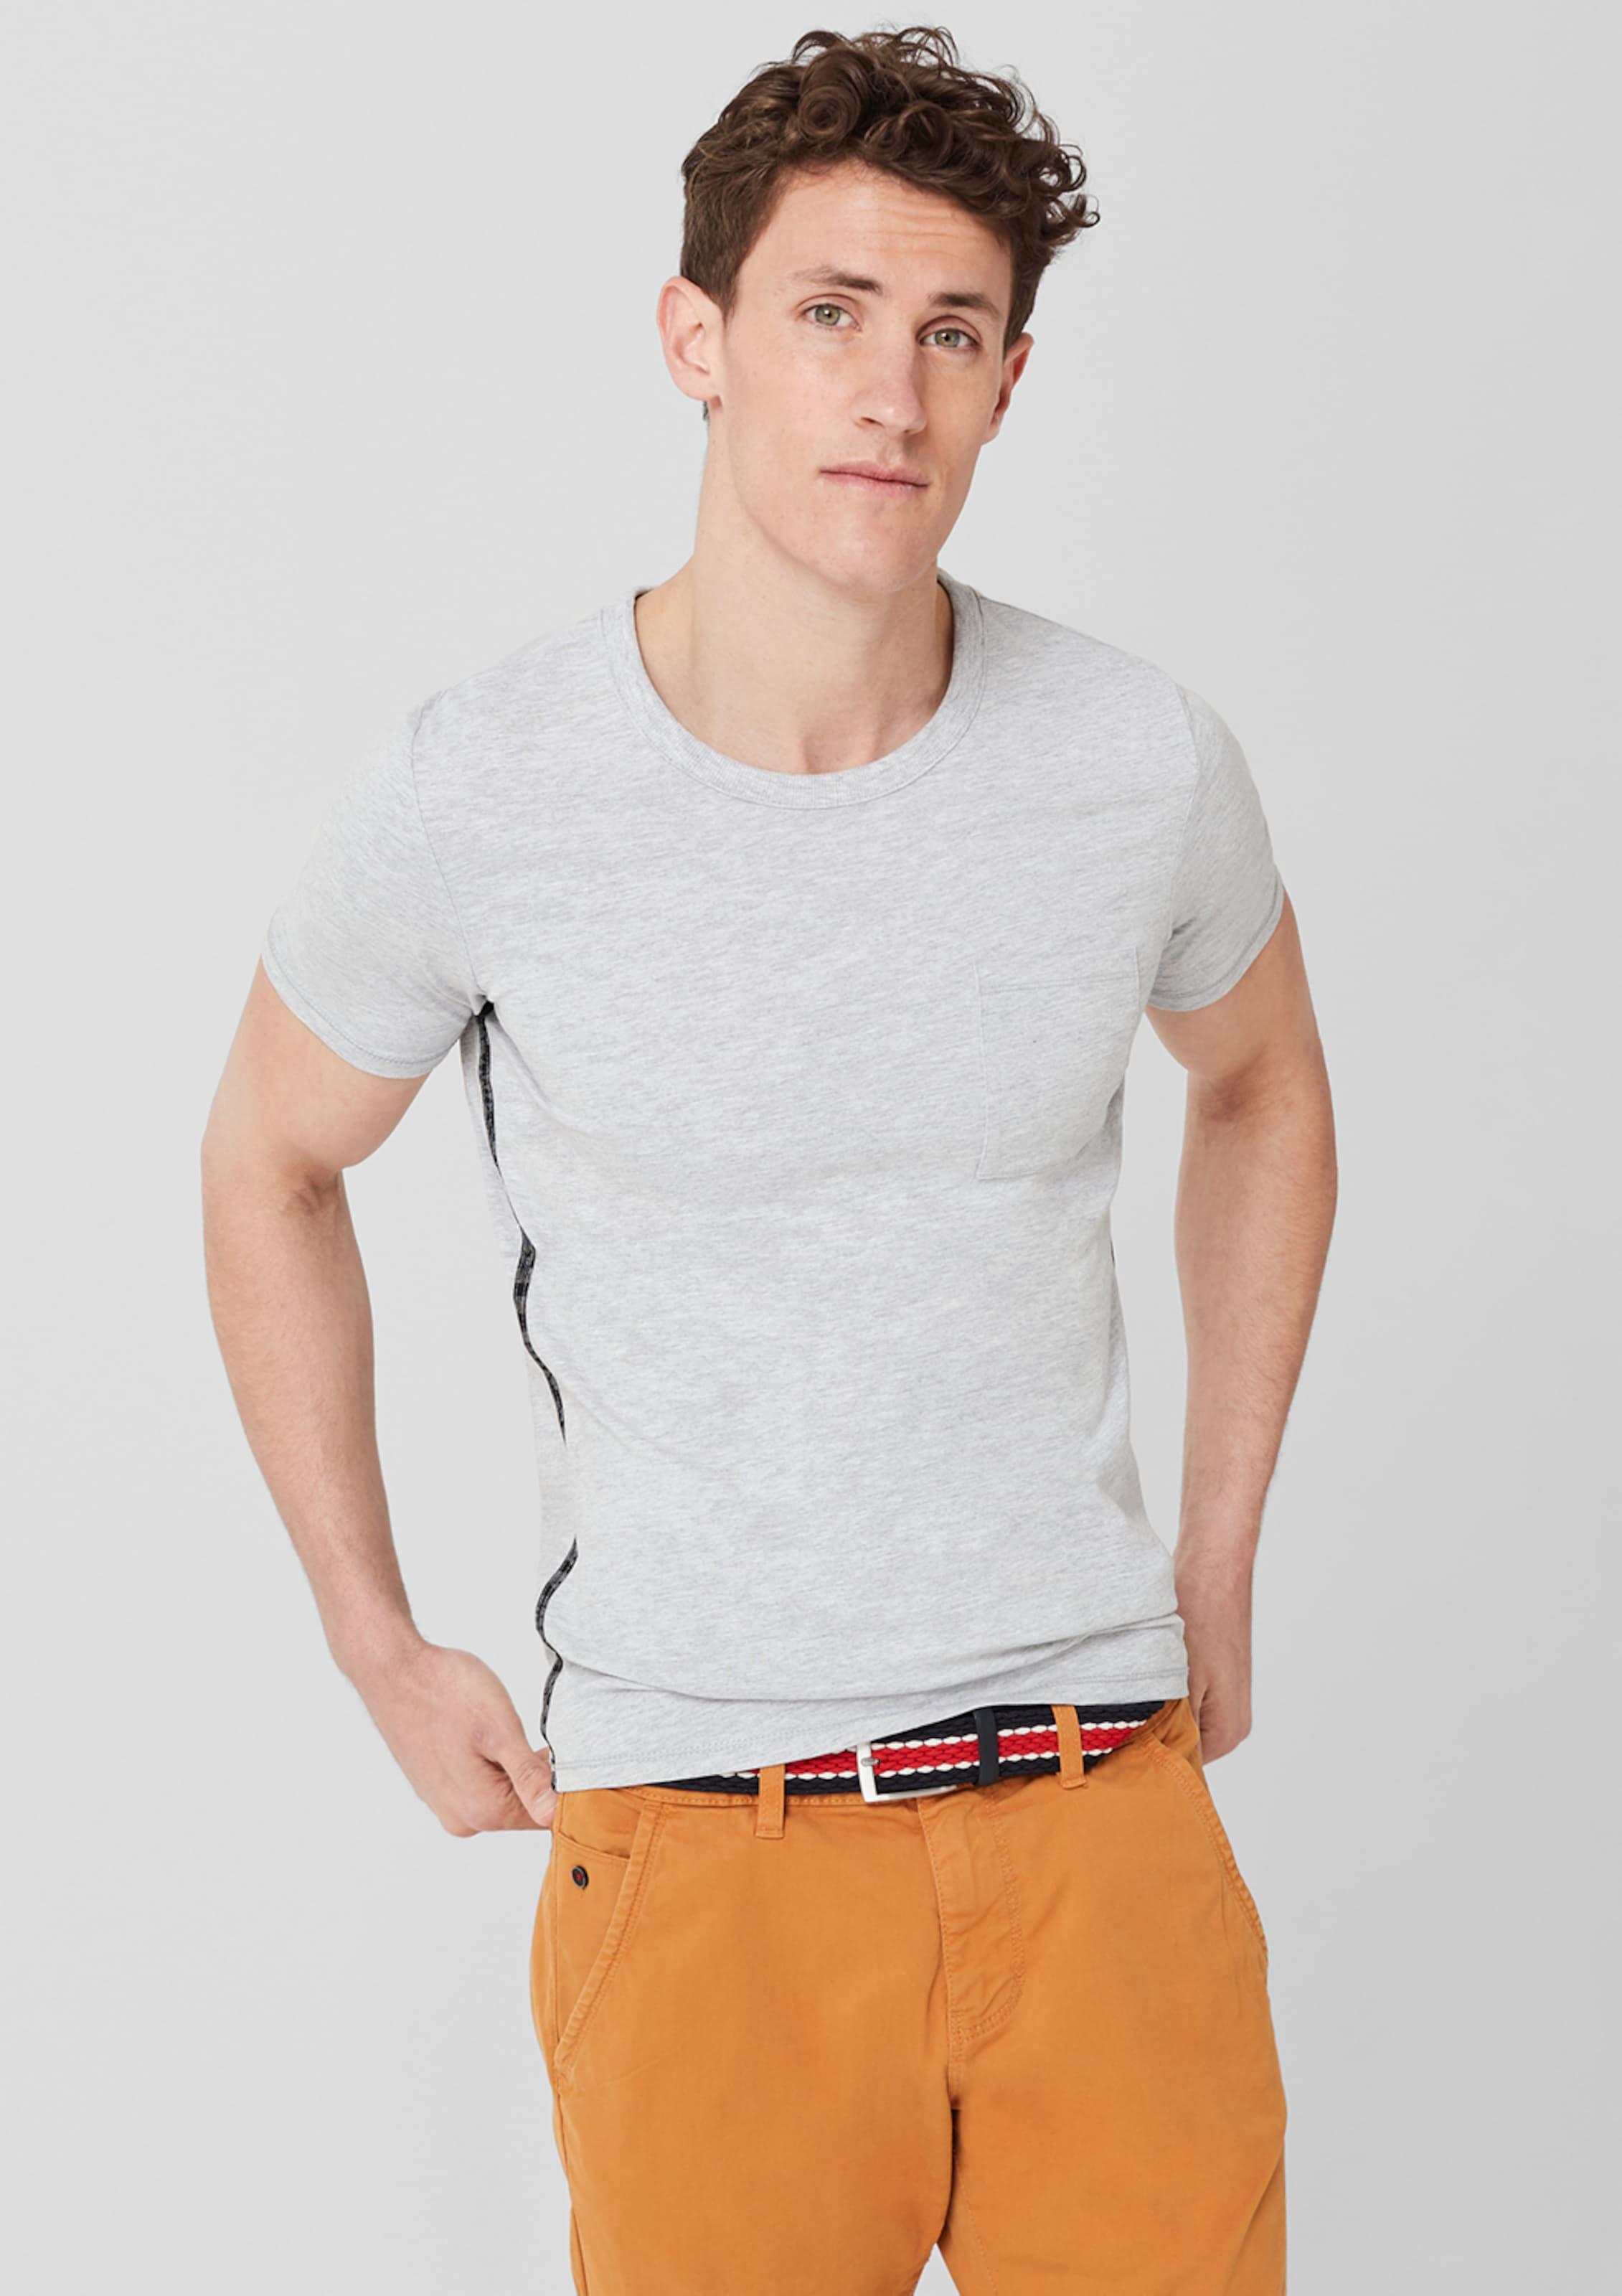 S In oliver Red T Label Grau shirt 0Nnwm8